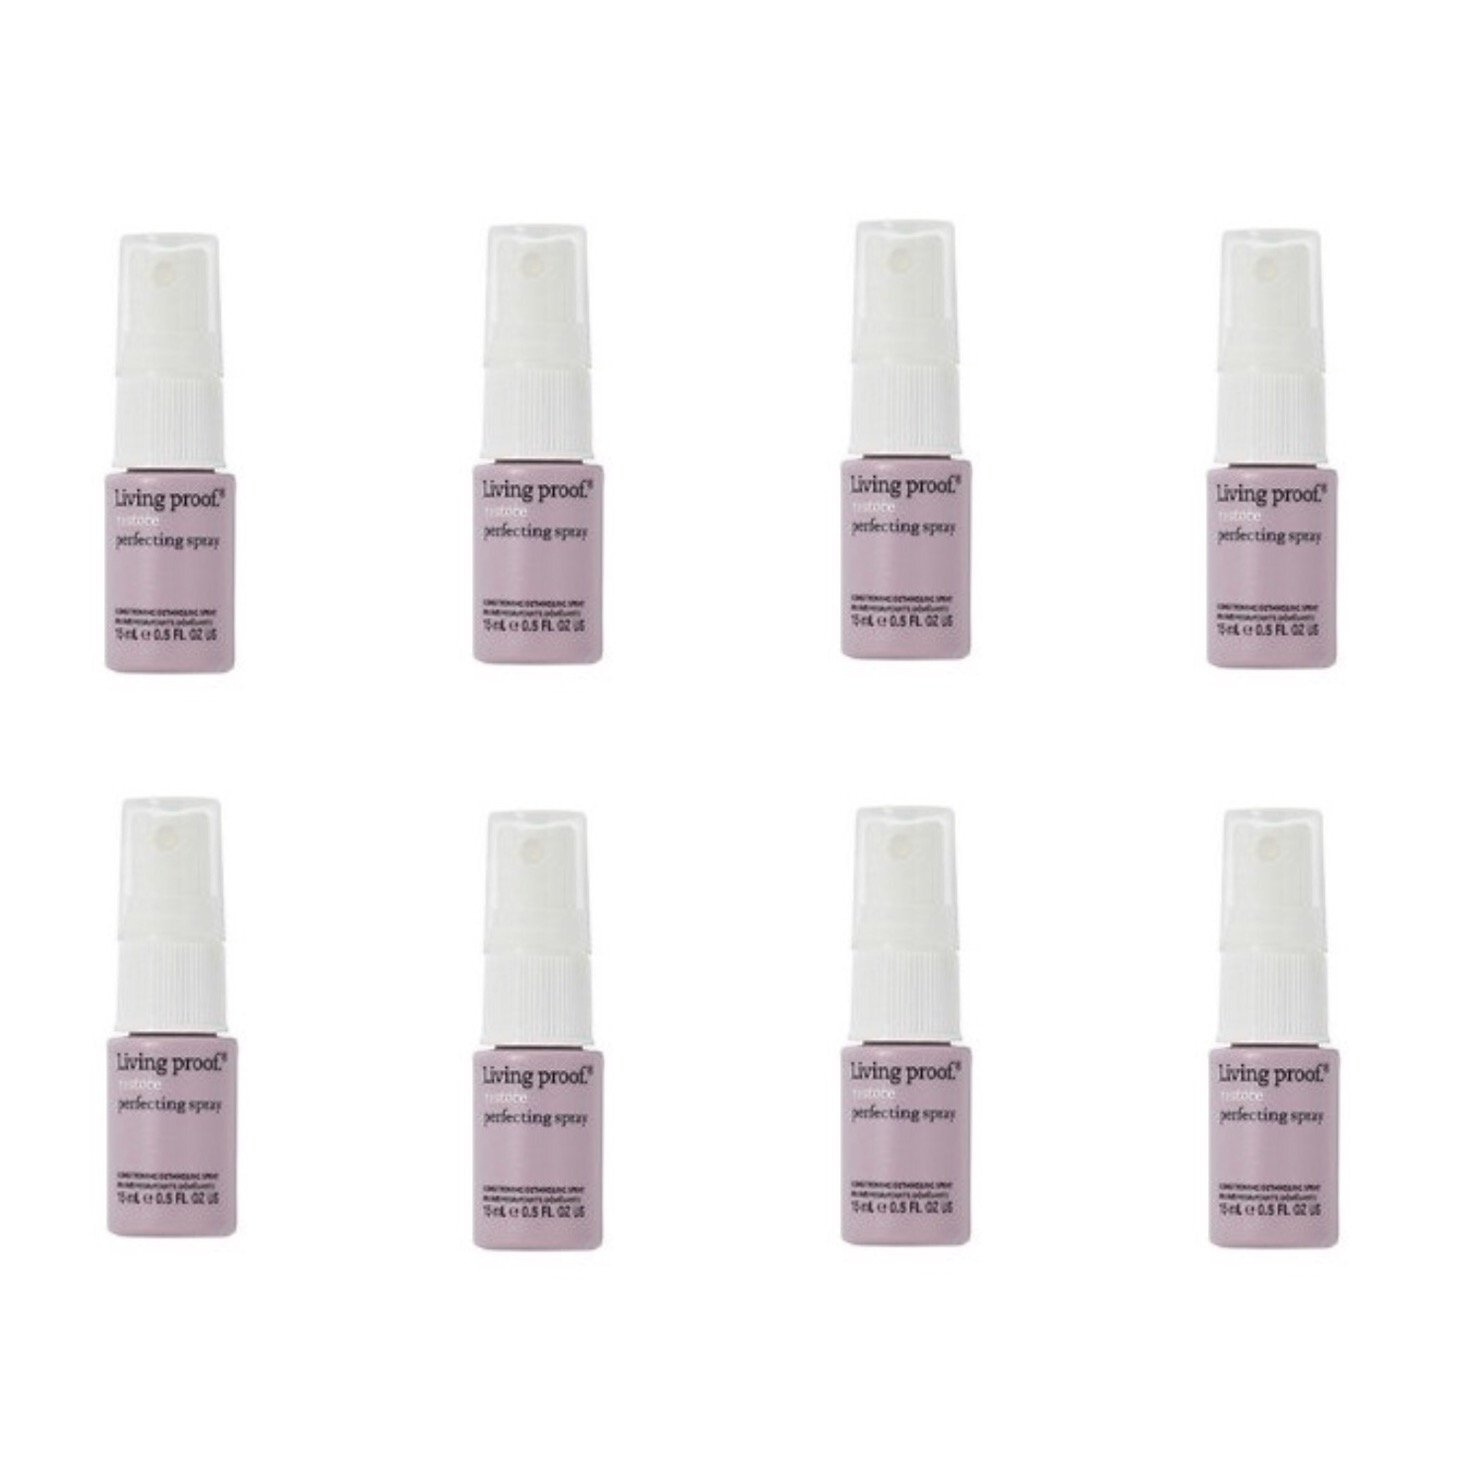 Living Proof Restore Perfecting Spray Coditioning Detangling Spray ~ Mini Set of 8 ~ 0.5 fl oz each/ total 4 fl oz